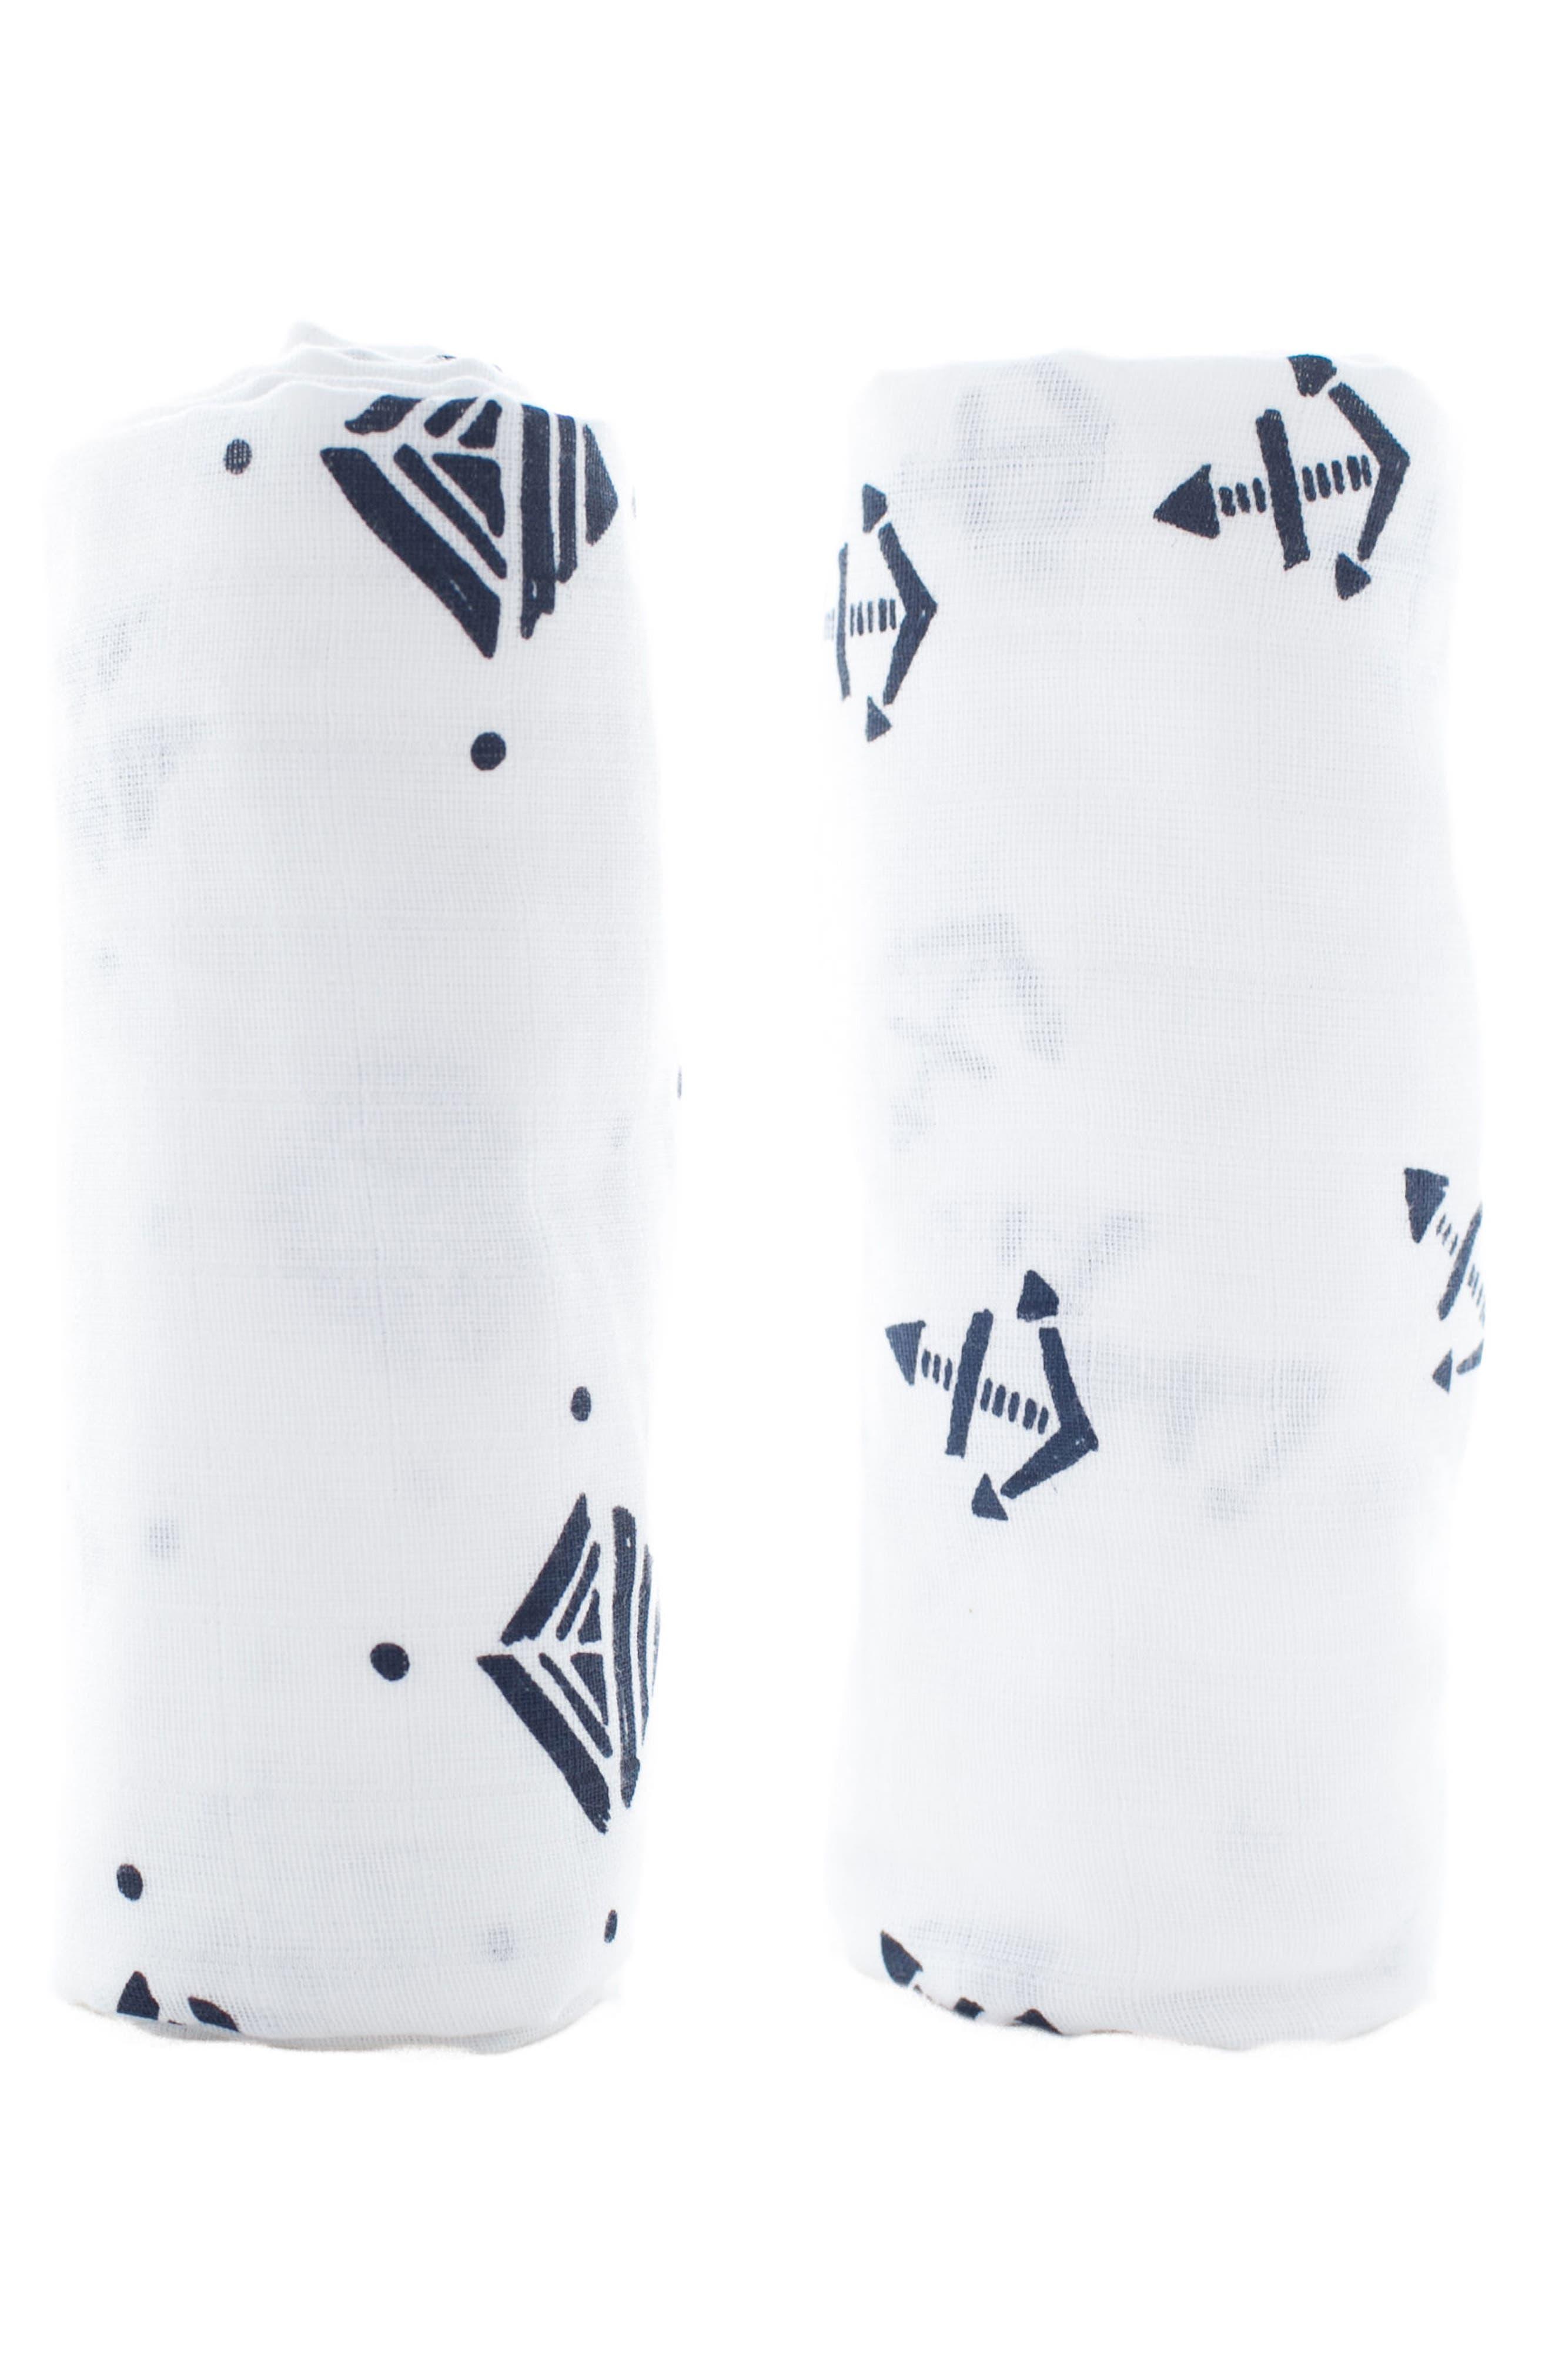 Main Image - Lil Lemon by zestt Urban Geometry 2-Pack Organic Cotton Swaddle Blankets